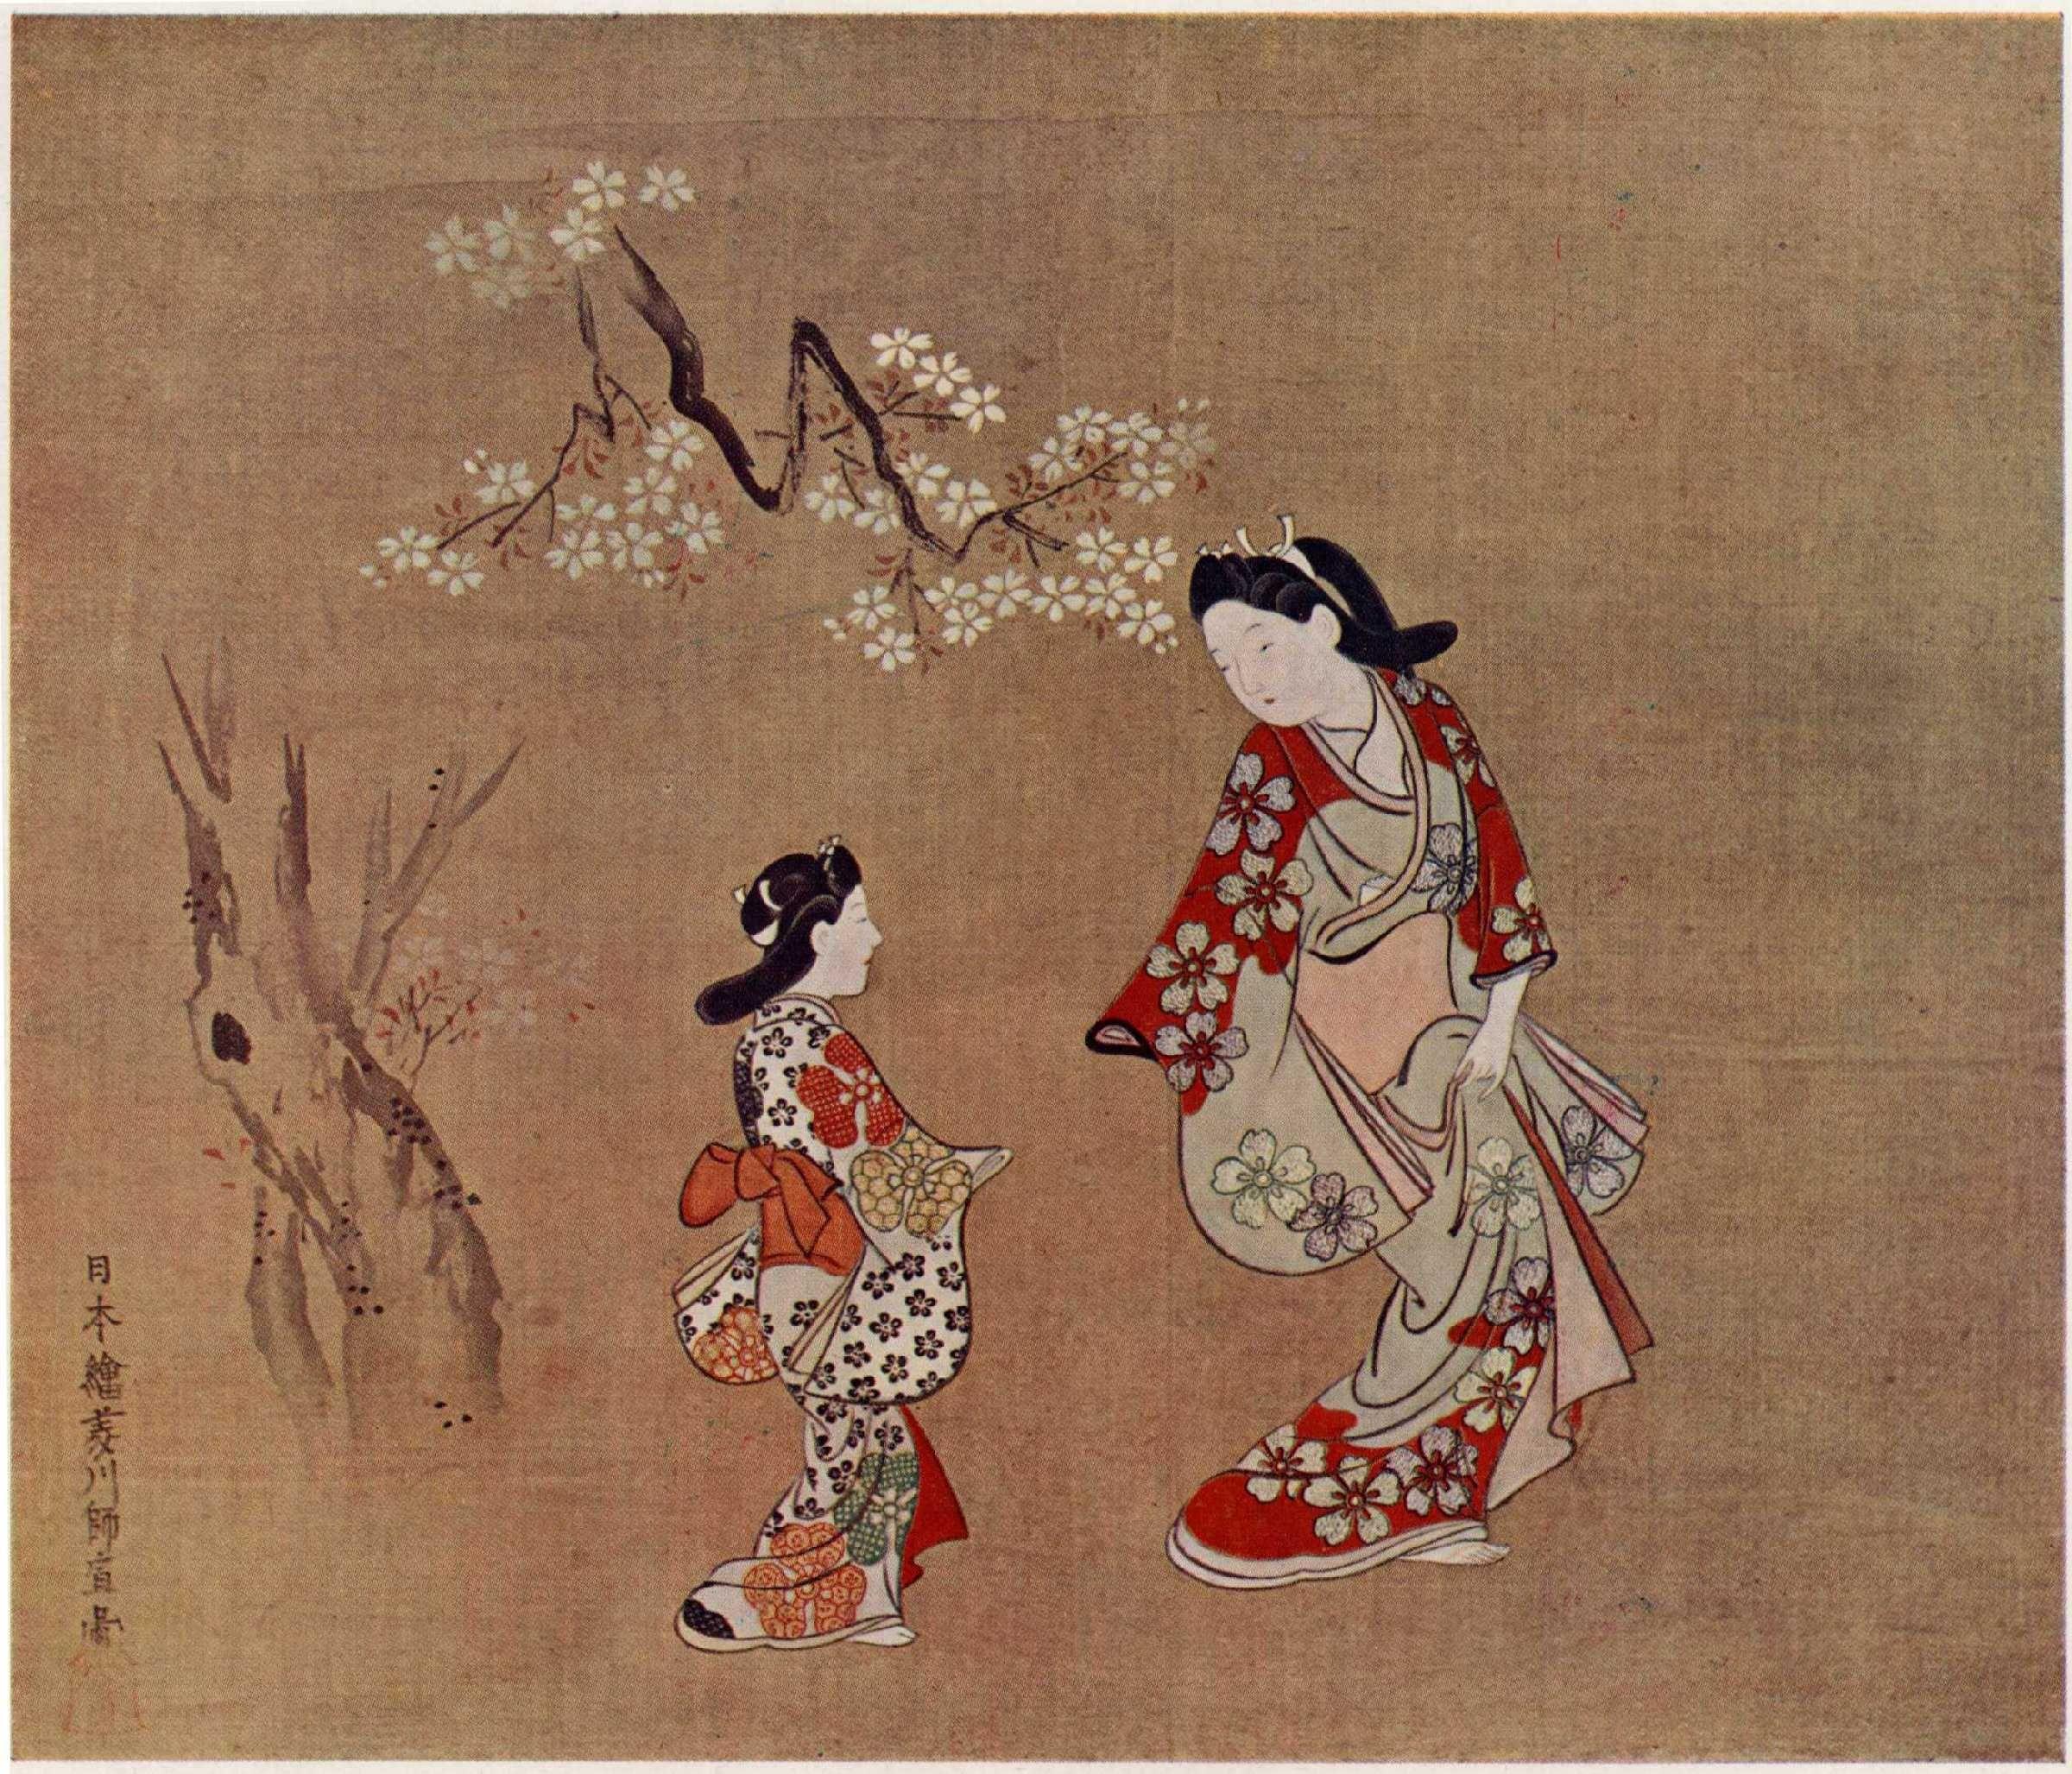 Hishikawa moronobu edo period pinterest japanese